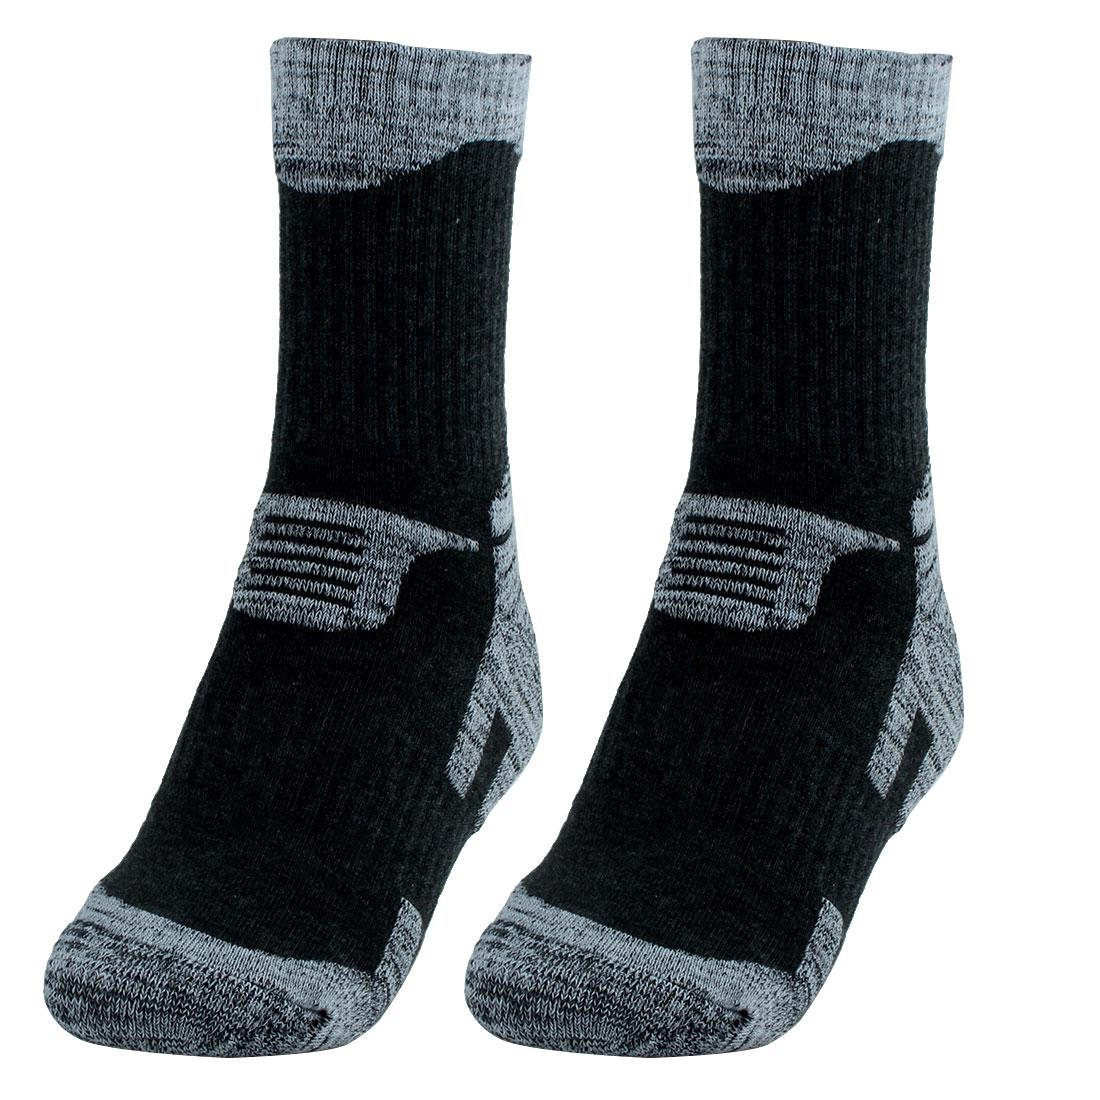 R-BAO Authorized Men Trekking Hiking Exercise Sports Cycling Socks Black L Pair